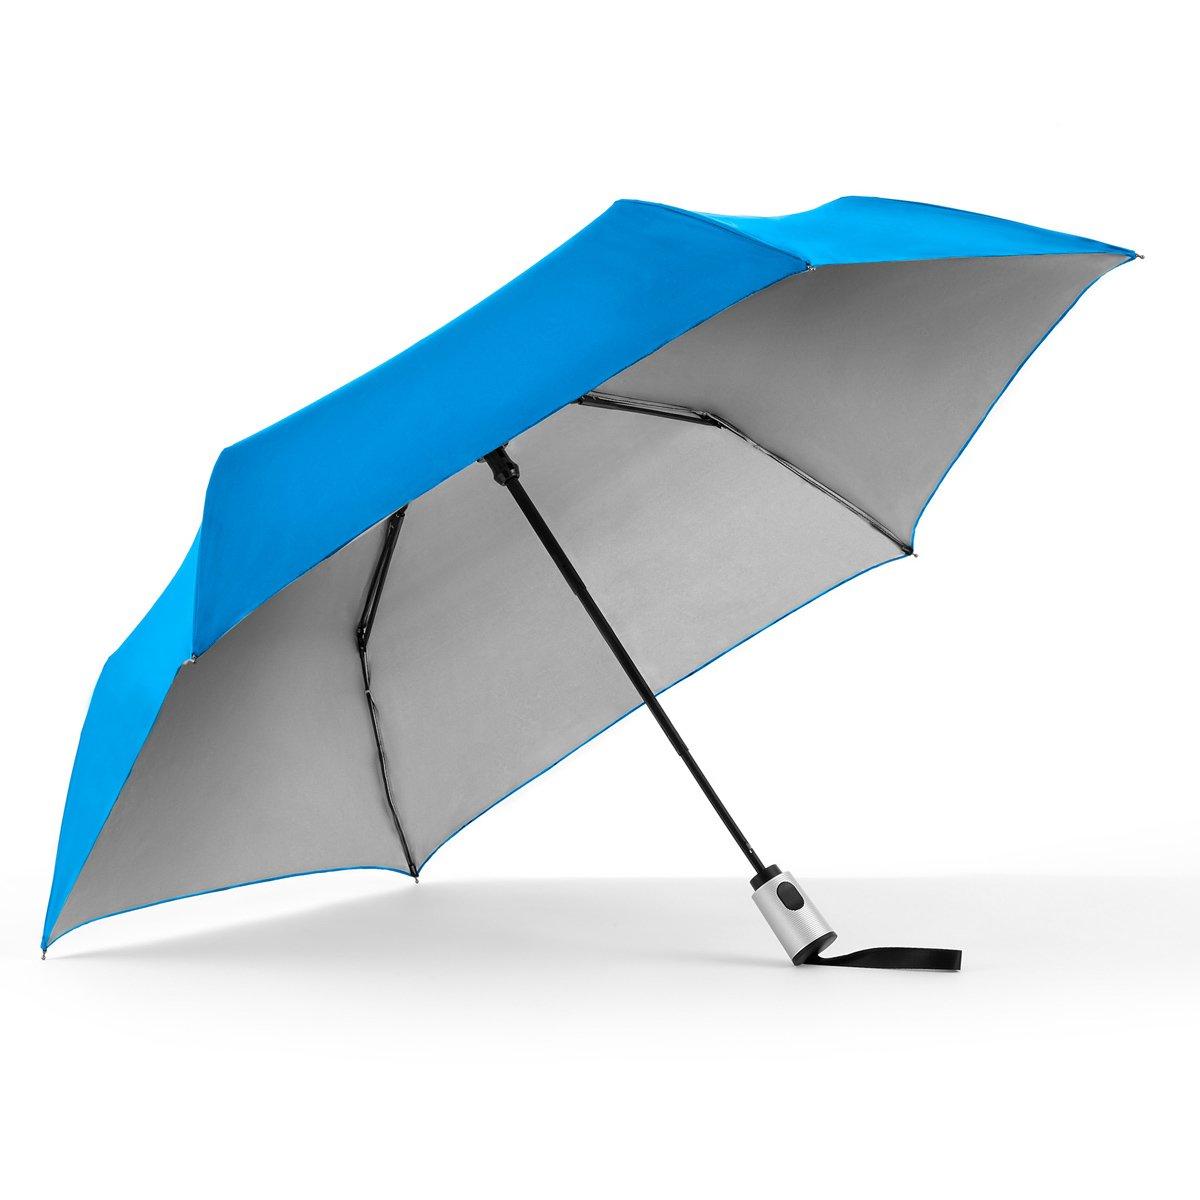 ShedRain Shedrays Auto Open UPF 50+ Compact Umbrella